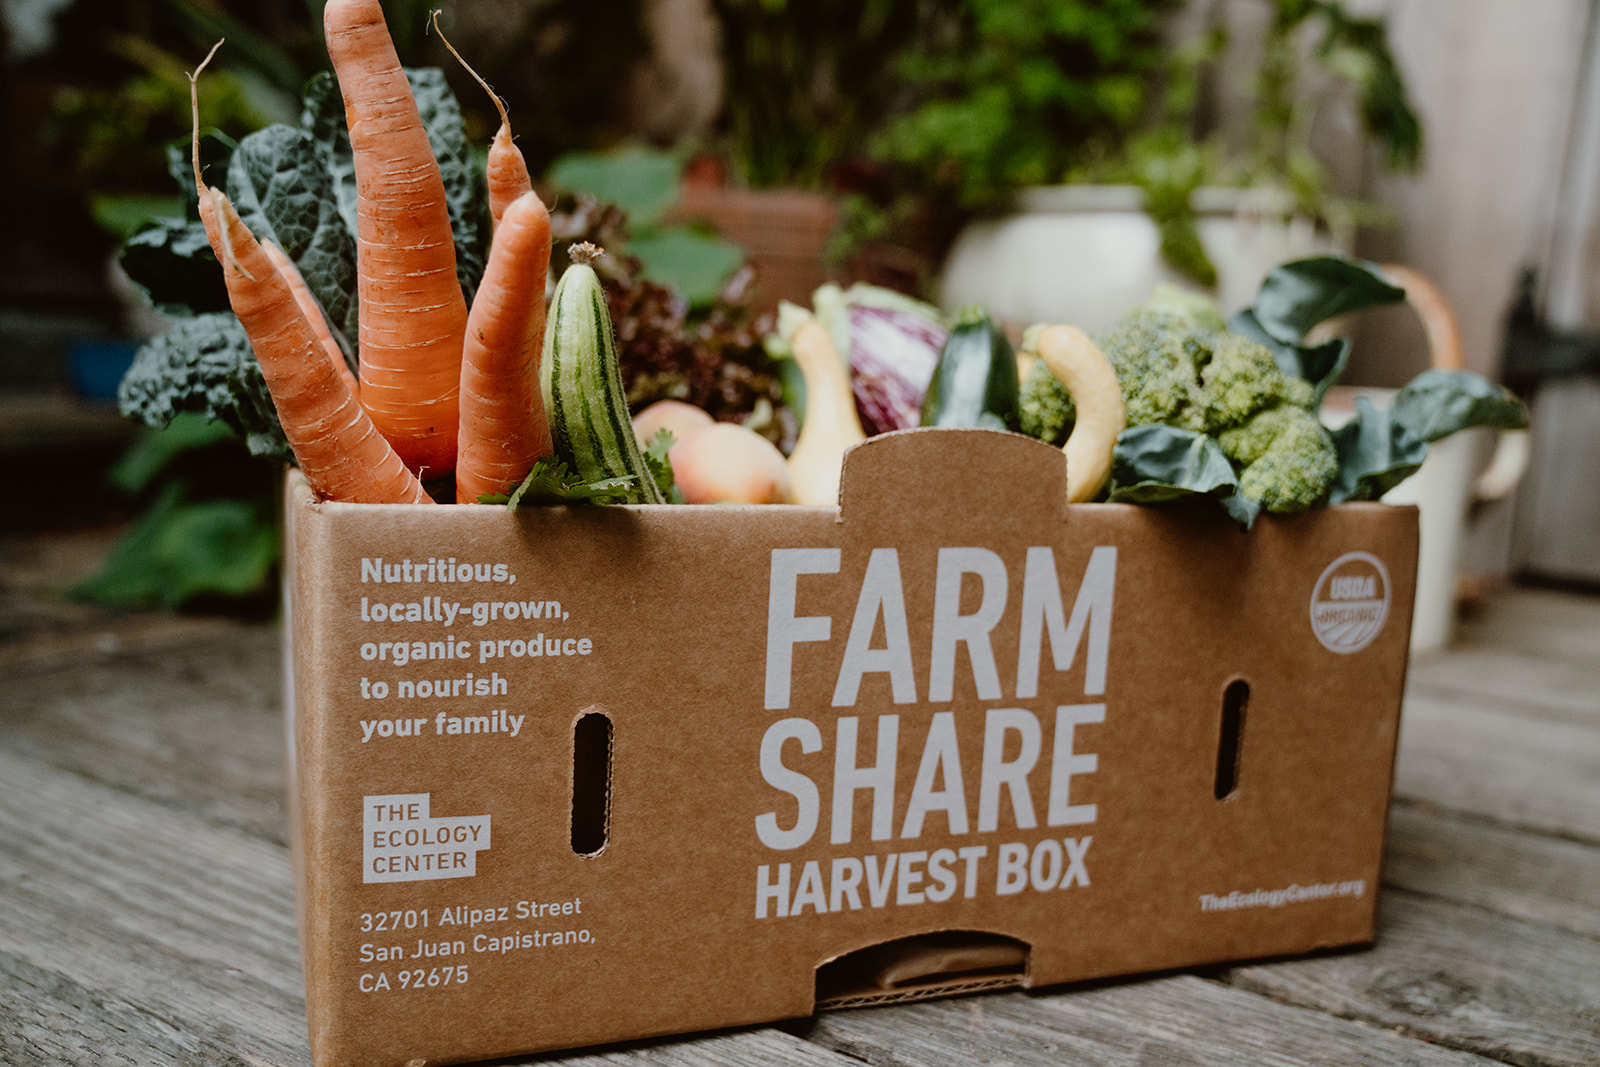 Harvest Box with organic fresh produce.